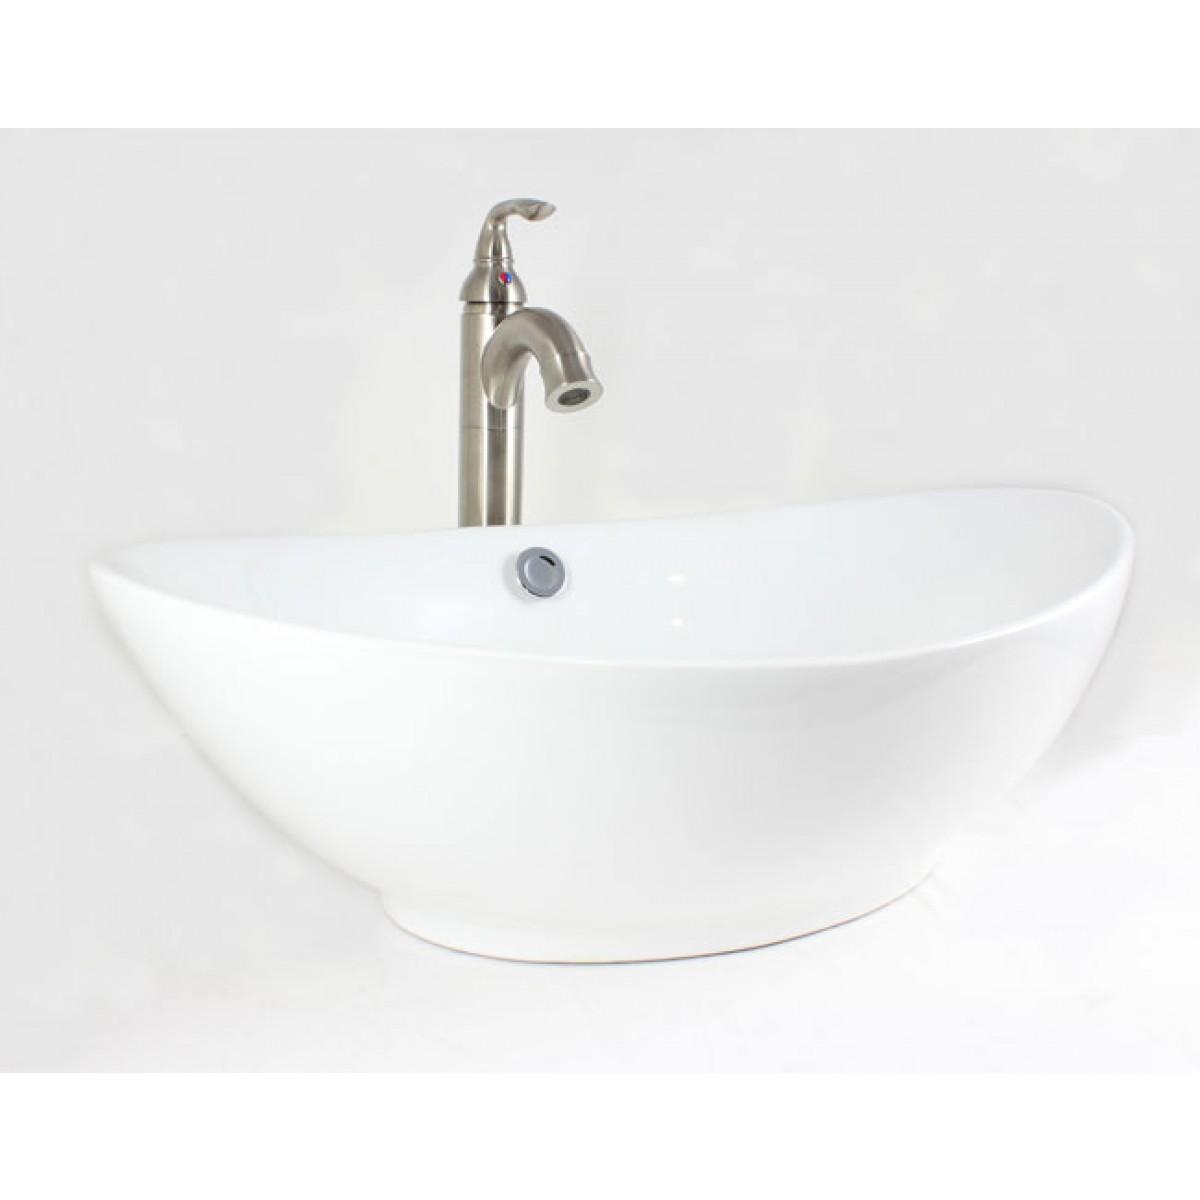 White Biscuit Black Porcelain Ceramic Countertop Bathroom Vessel Sink 23 1 4 X 15 7 2 Inch